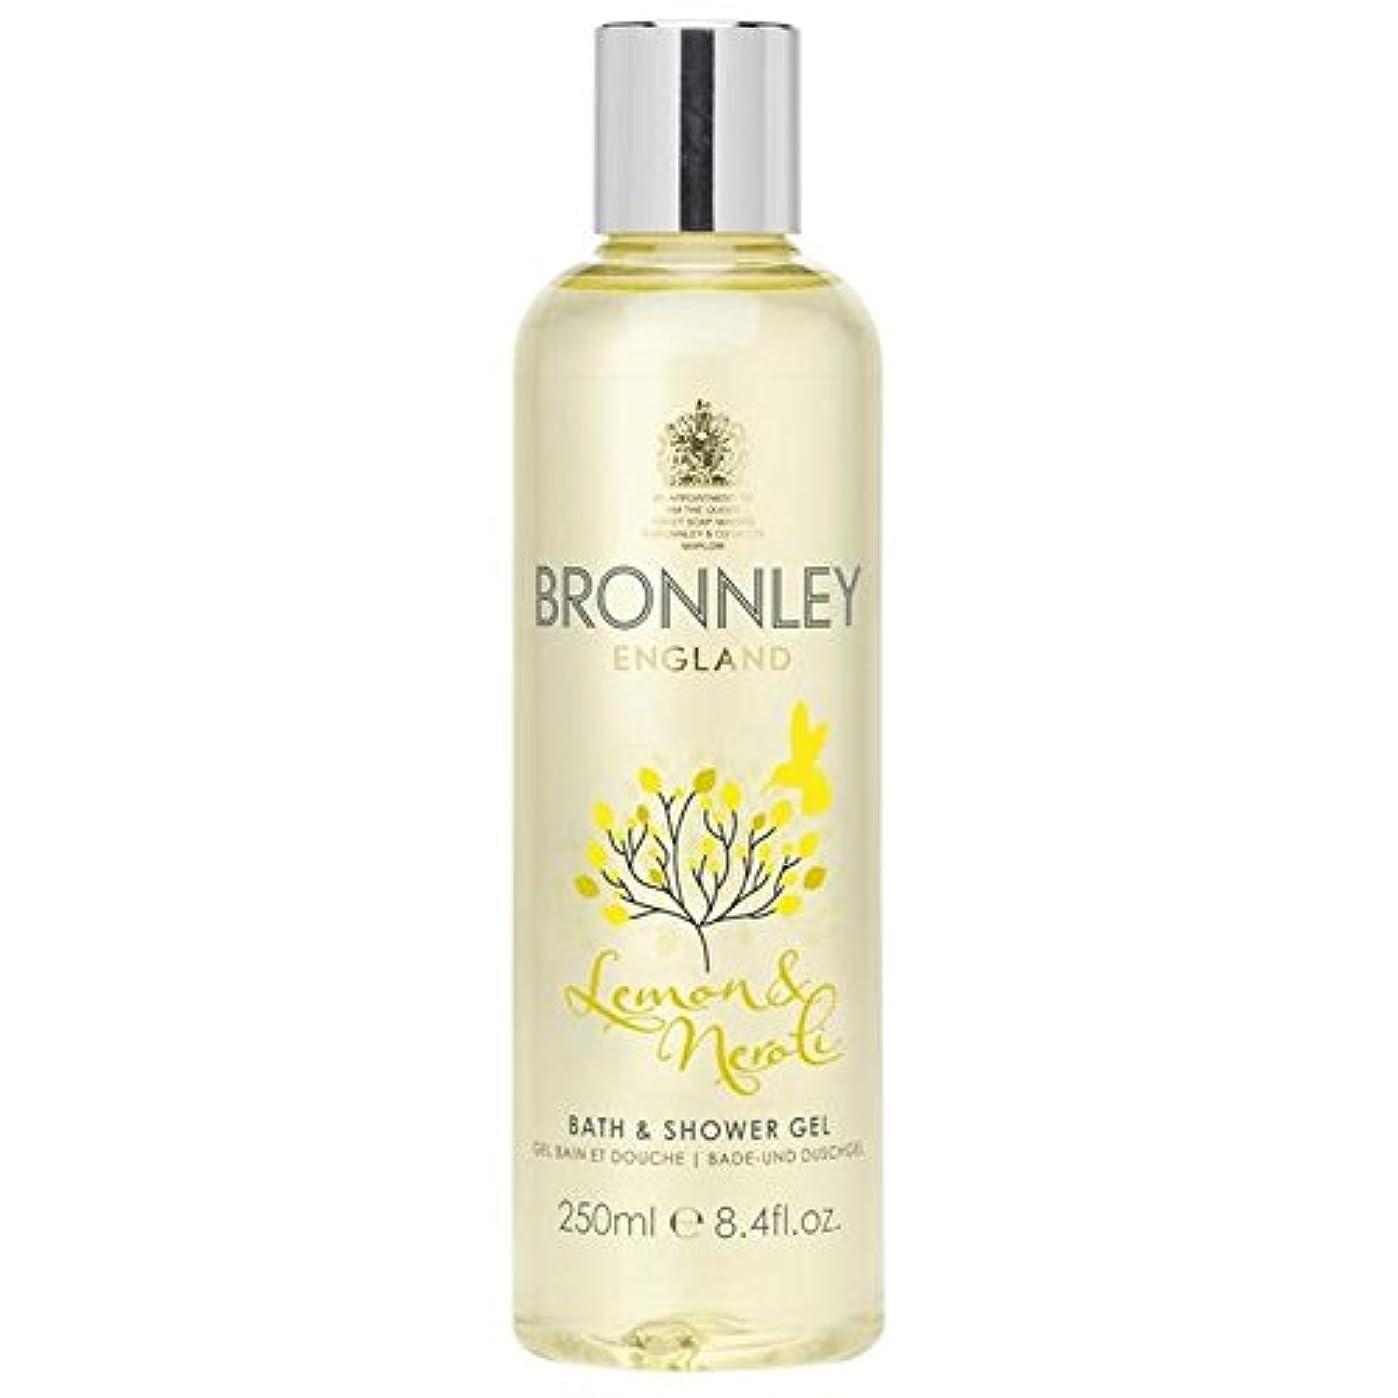 Bronnley Lemon & Neroli Bath & Shower Gel 250ml (Pack of 6) - レモン&ネロリバス&シャワージェル250ミリリットル x6 [並行輸入品]